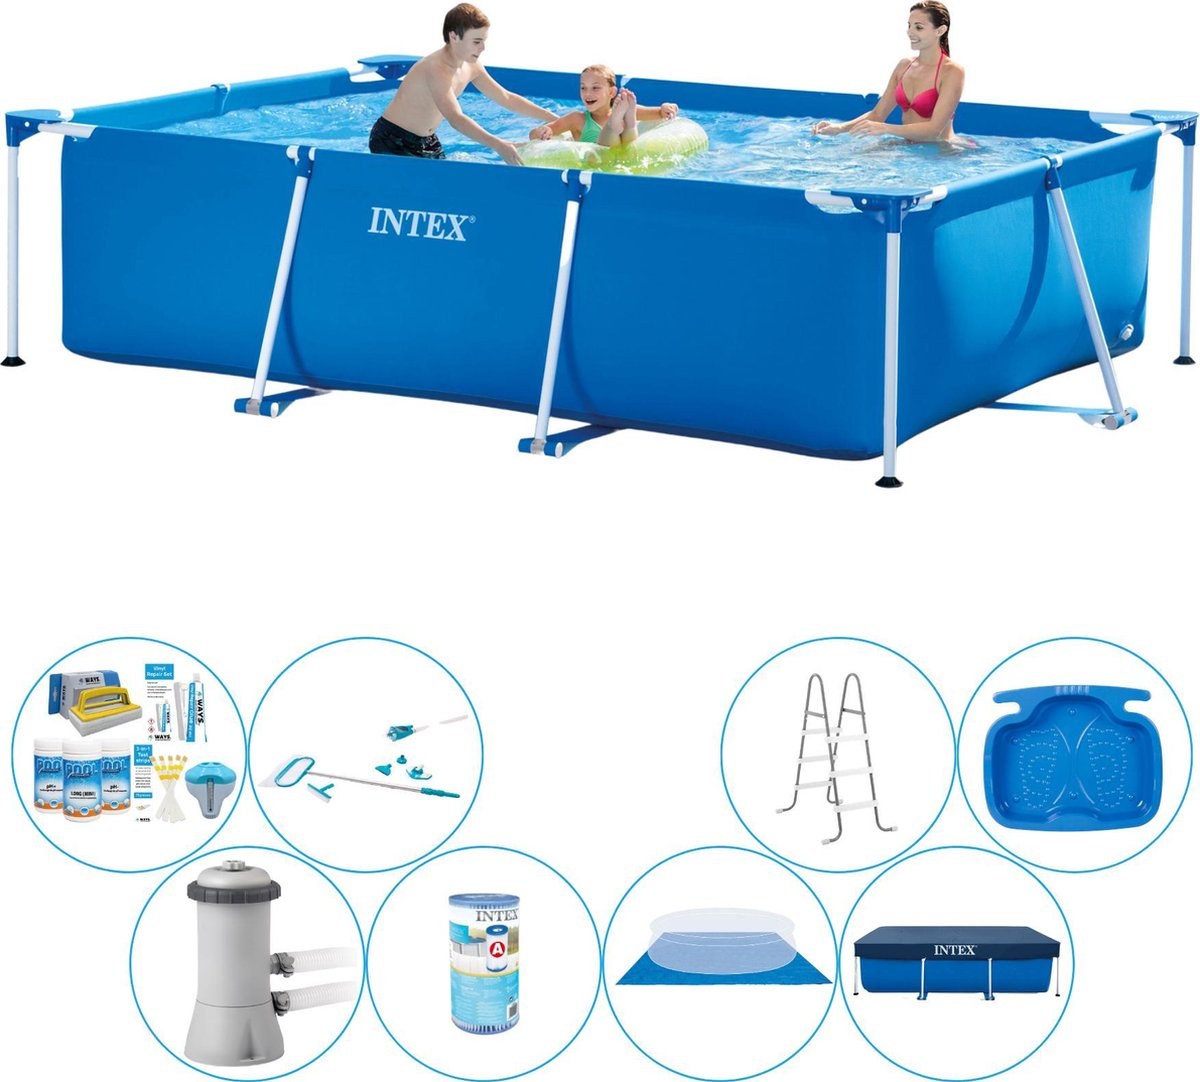 Intex Frame Pool Rechthoekig 300x200x75 cm - Alles in 1 Zwembad Pakket